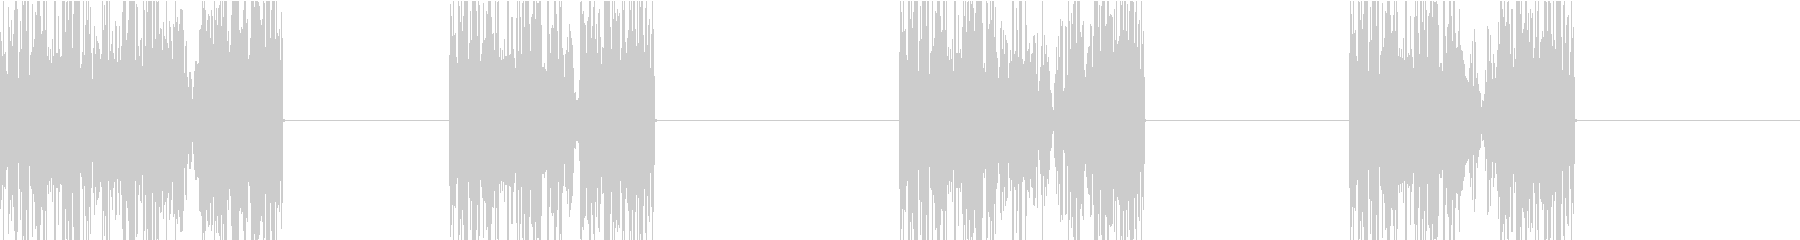 DJプレイ スクラッチ・ノイズ 143の未再生の波形